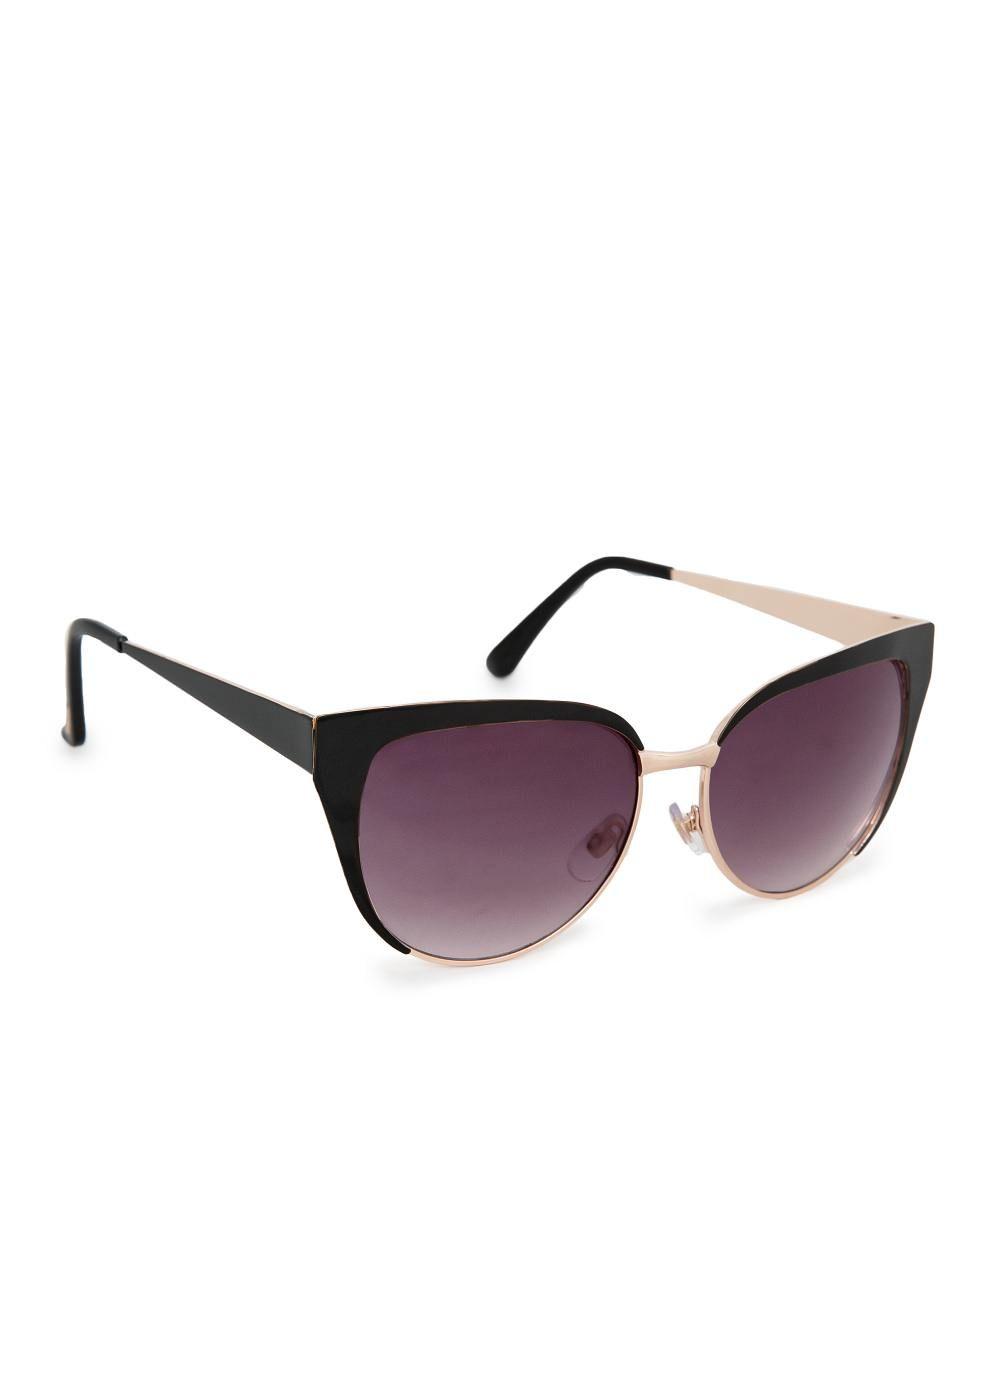 Retro Gafas Jewel De Sol Sunglasses WomenThe Elegant qSzpMVGU